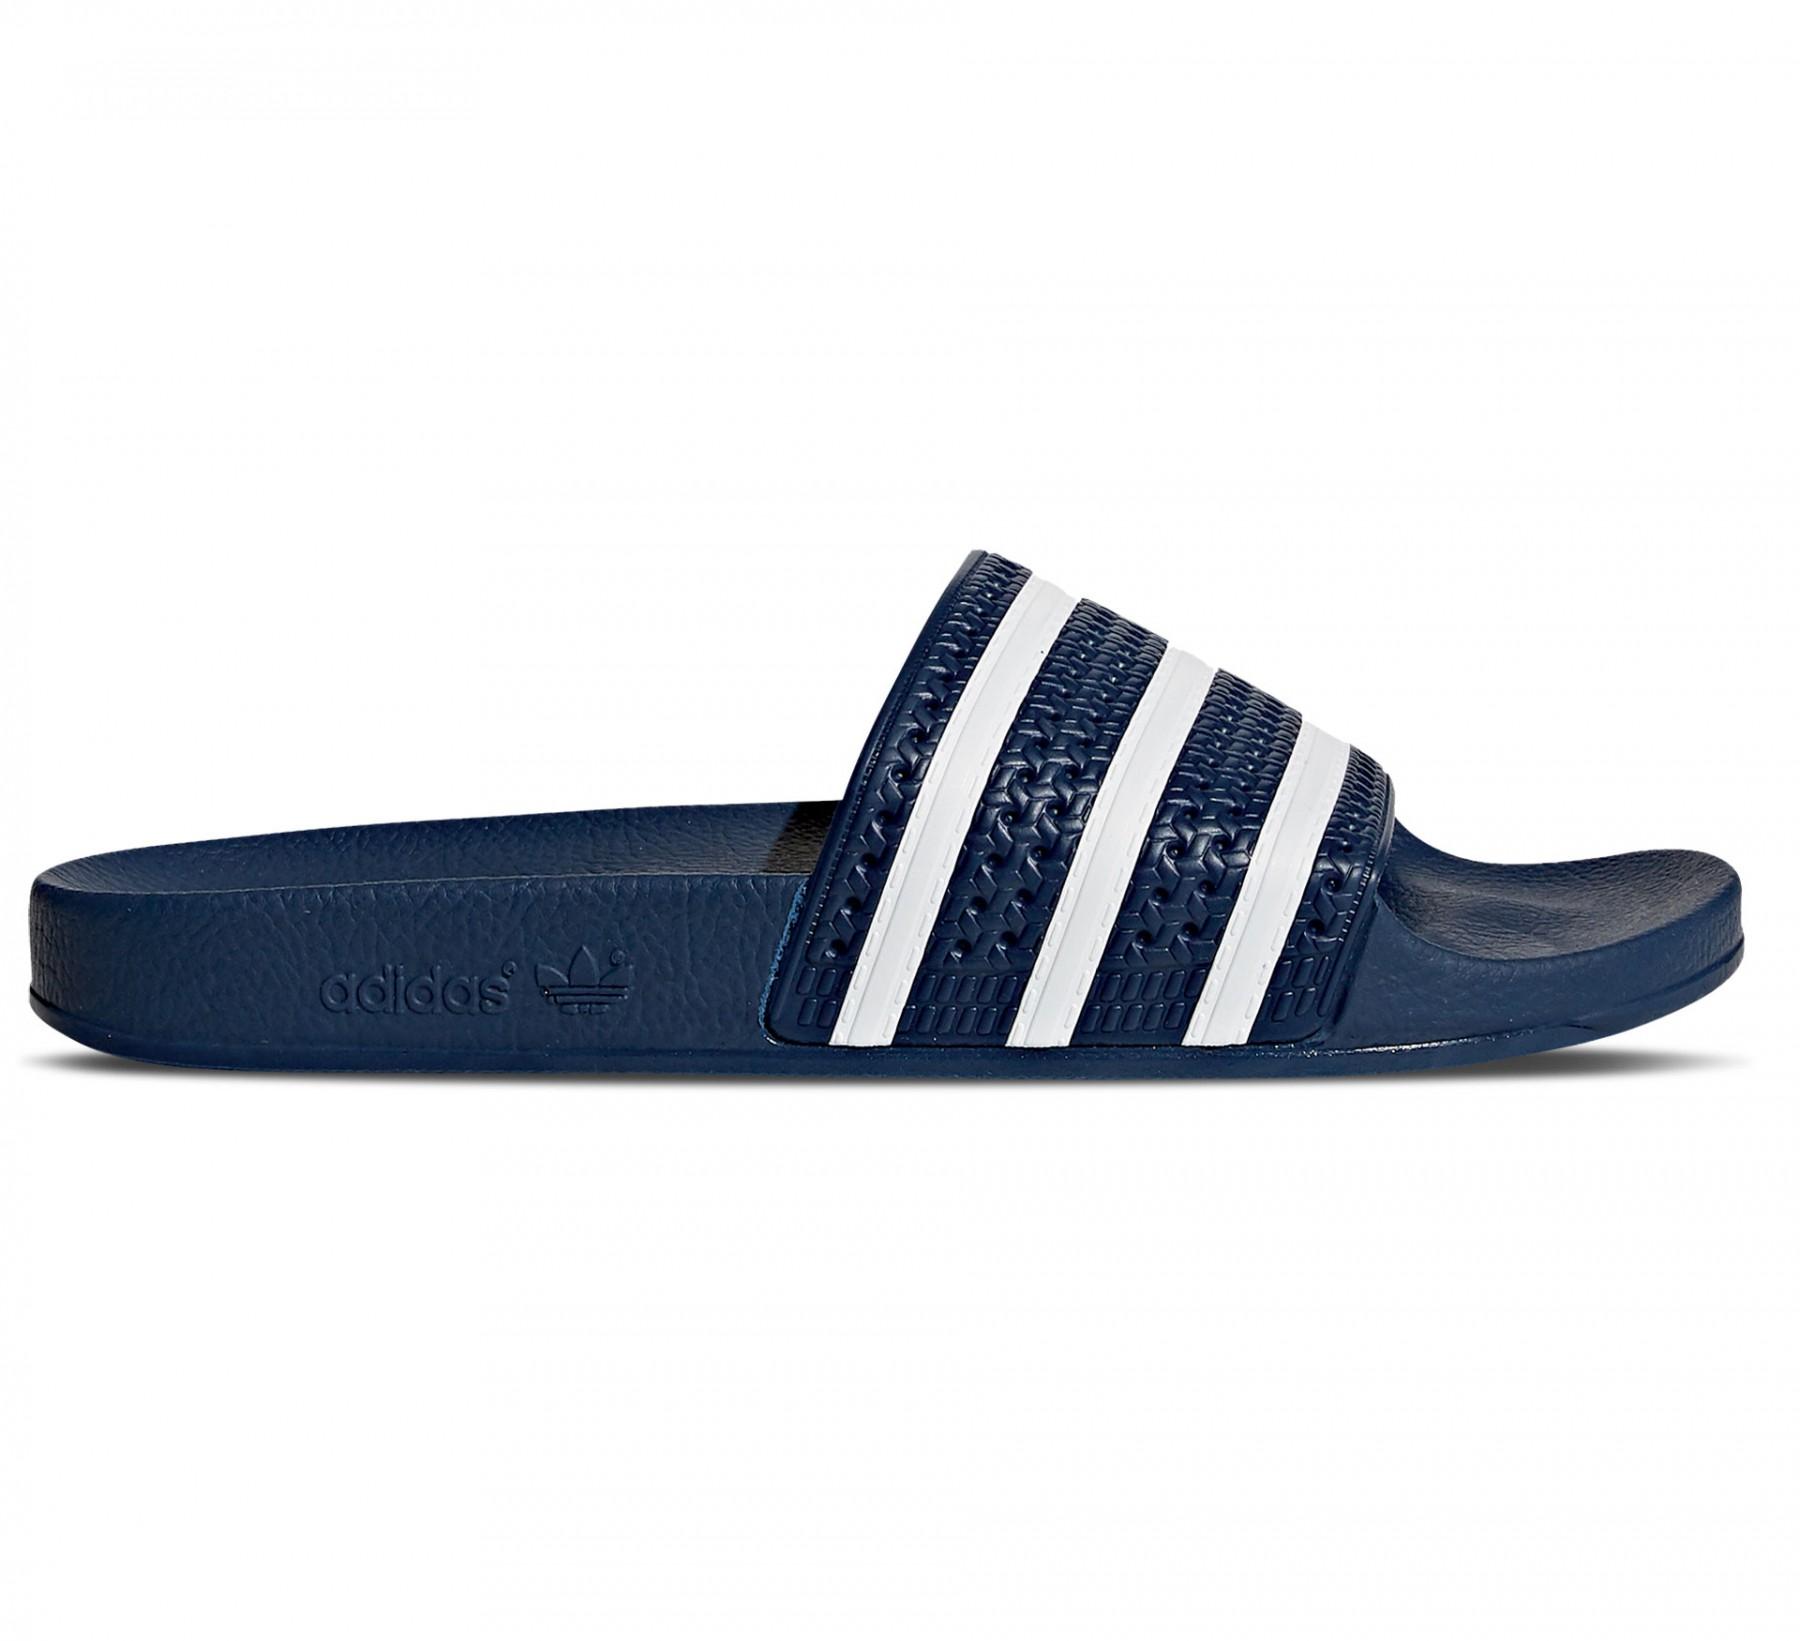 Donkerblauwe slippers Adidas Adilette Aqua - F35542 DKBLUE/FTWWHT/DK